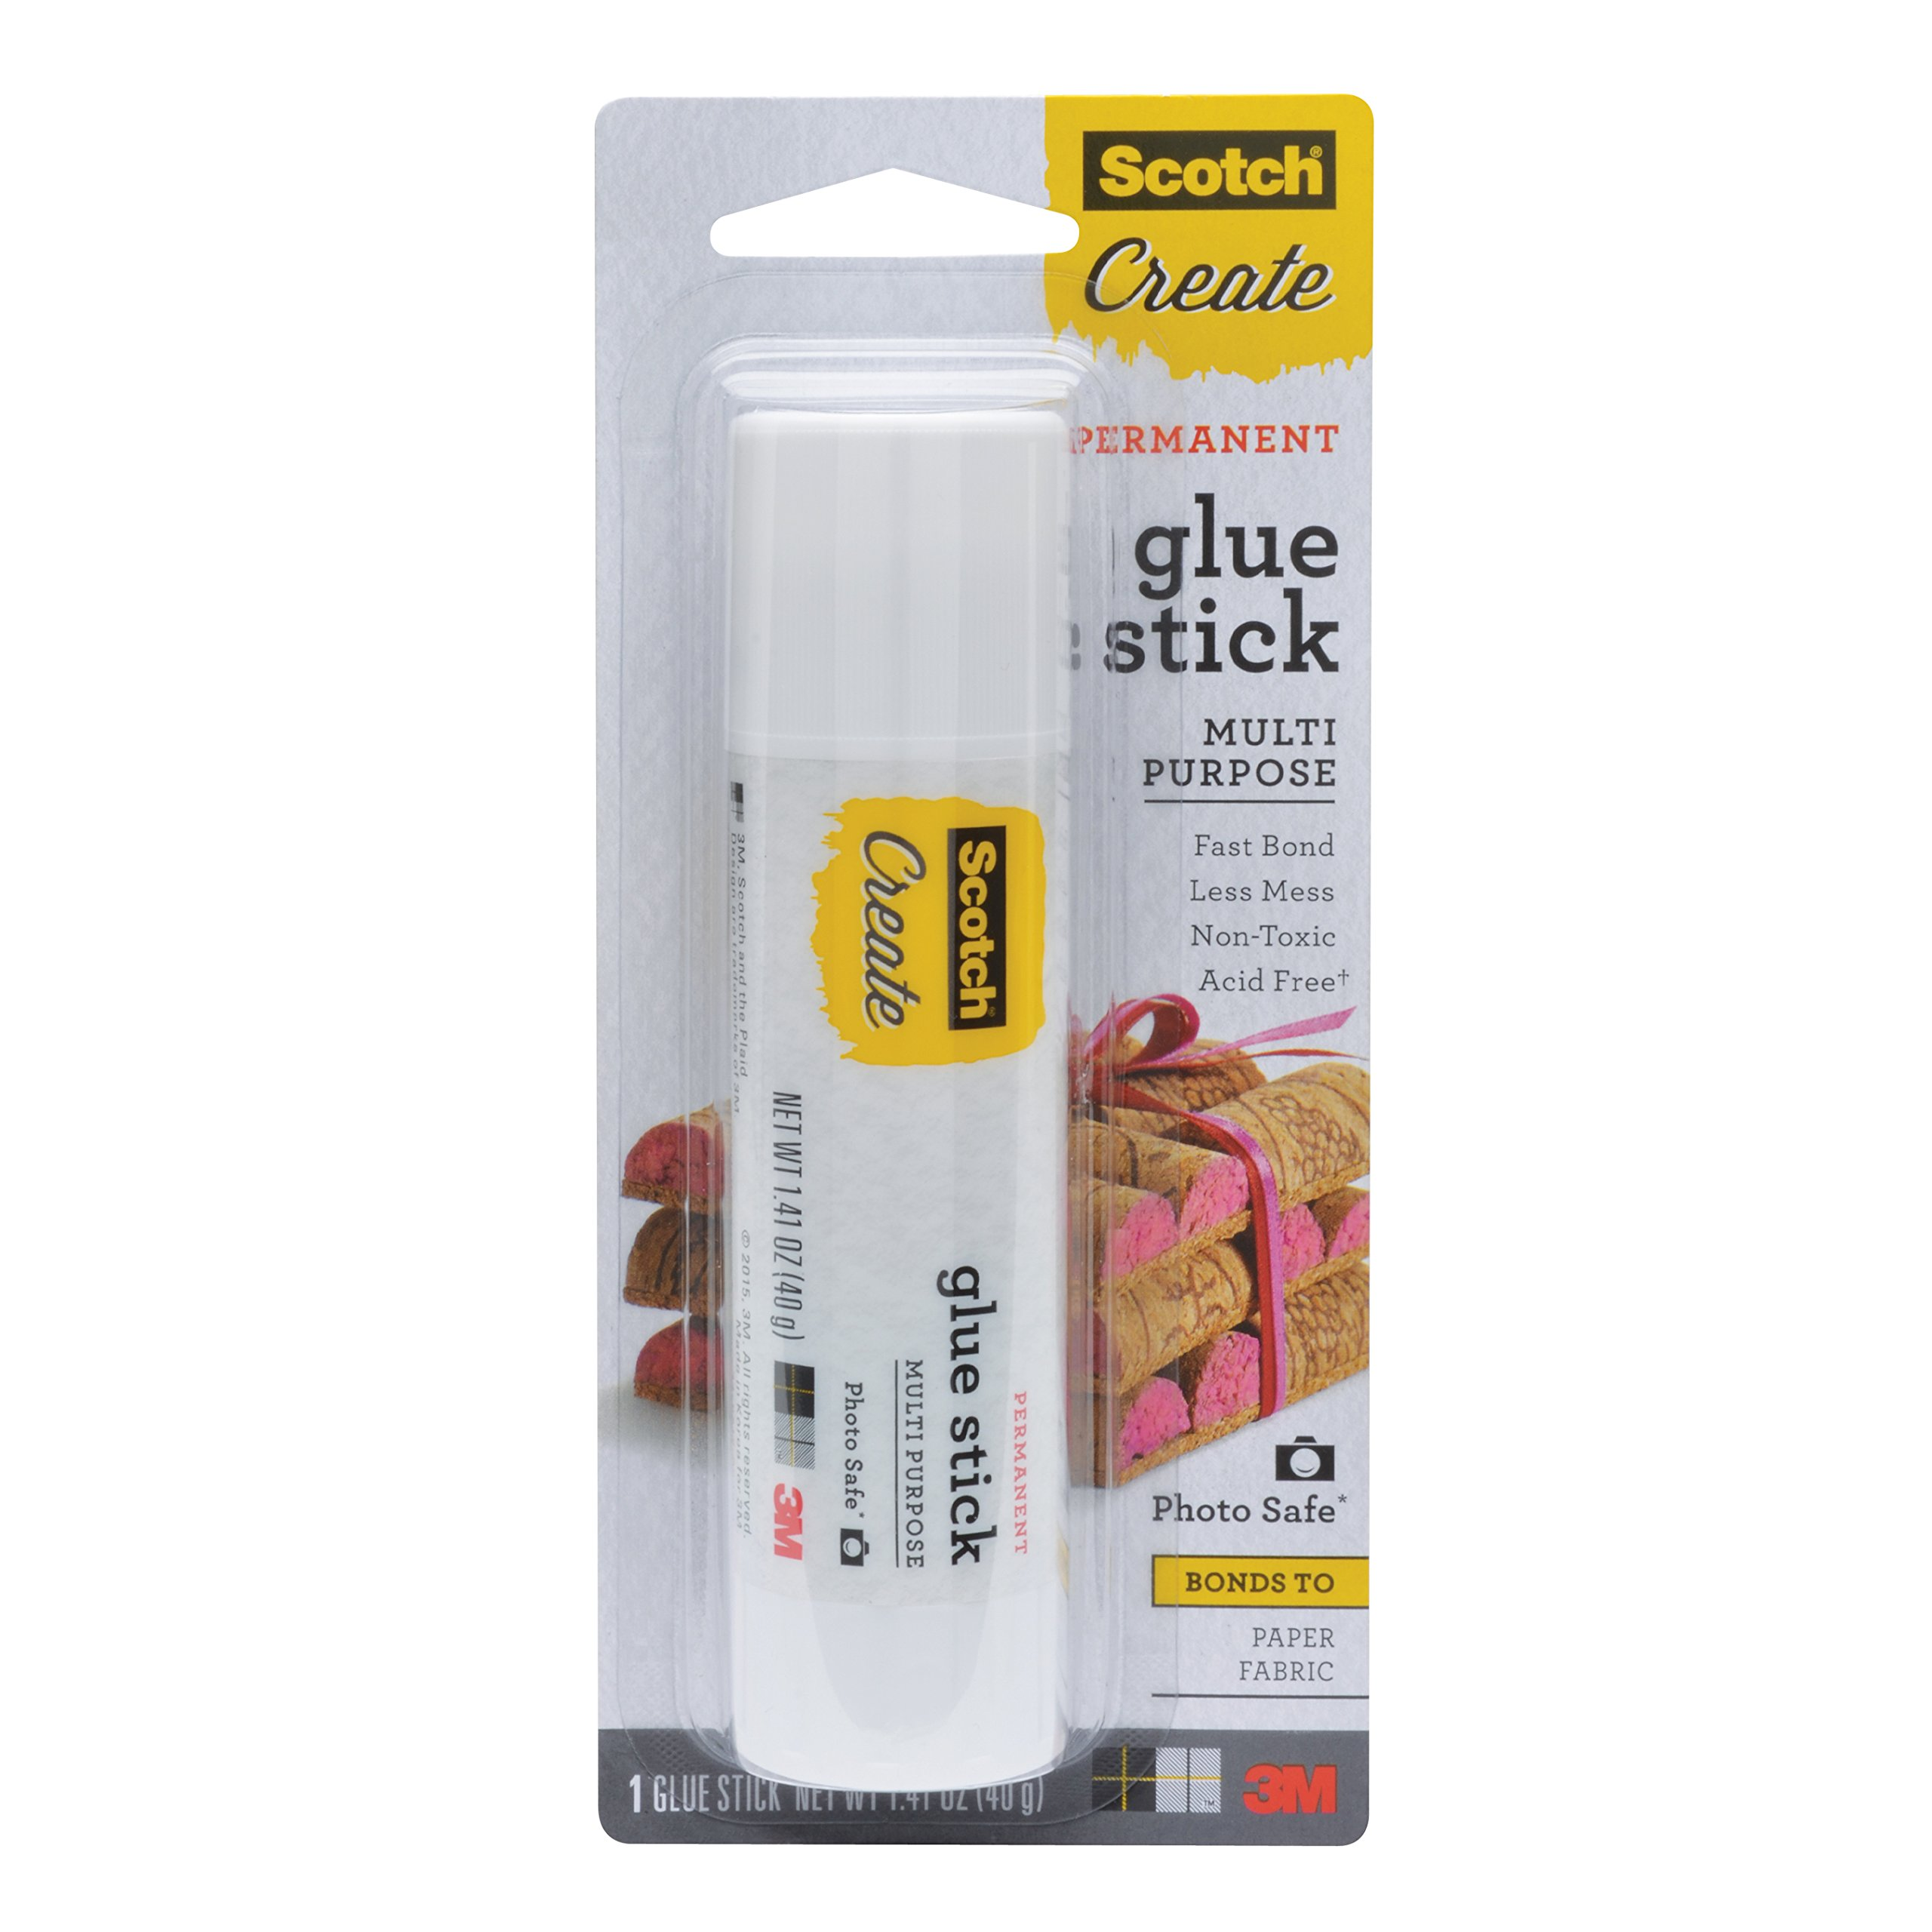 Scotch Glue Sticks, 4 Packs, 1.41 oz/Stick, 5.64 oz Total (003-CFT)